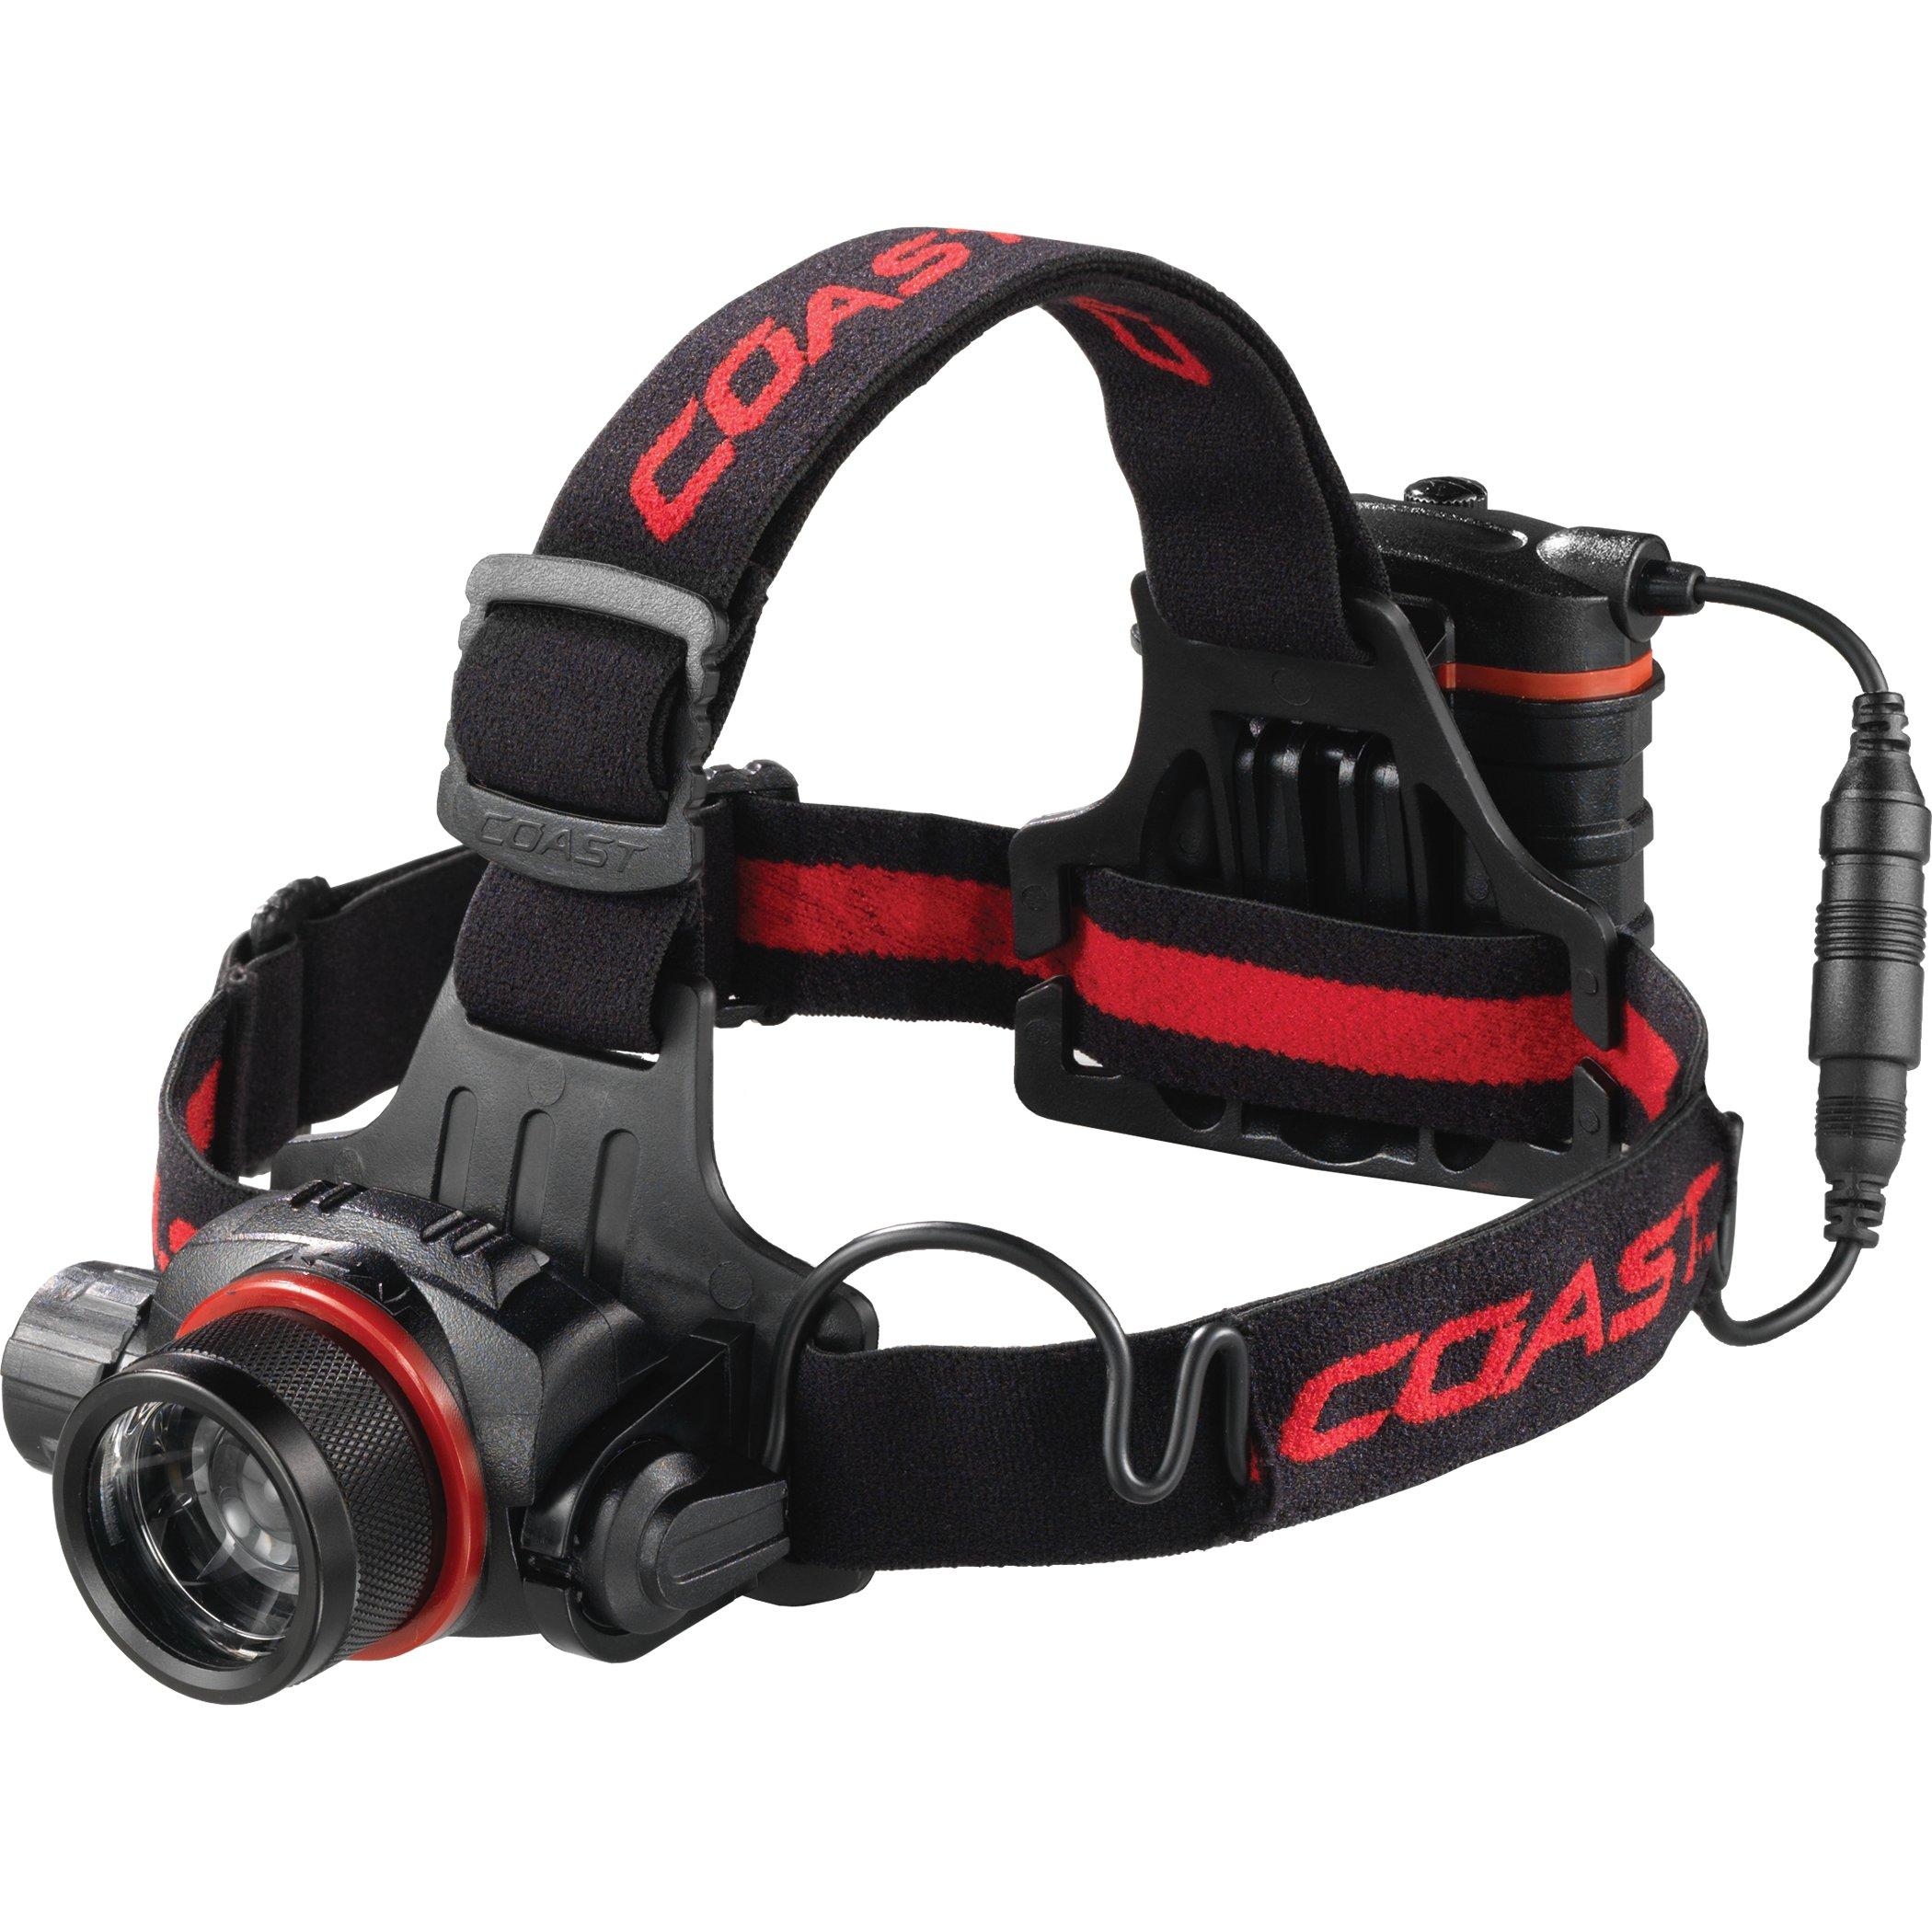 Coast HL8 390 lm Focusing LED Headlamp